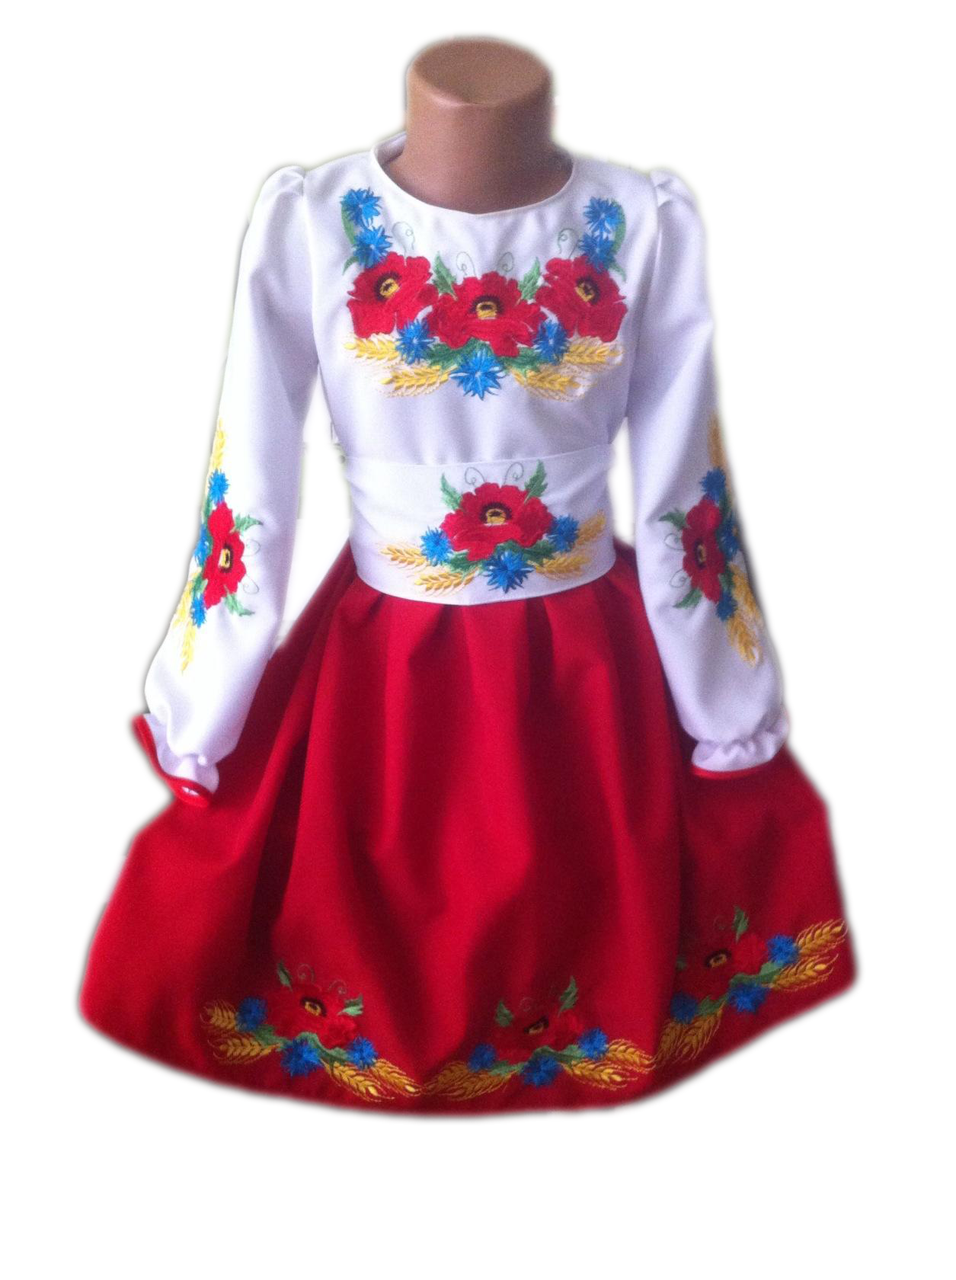 "Вишите плаття для дівчинки ""Моніса"" (Вышитое платье для девочки ""Мониса"") DT-0026"